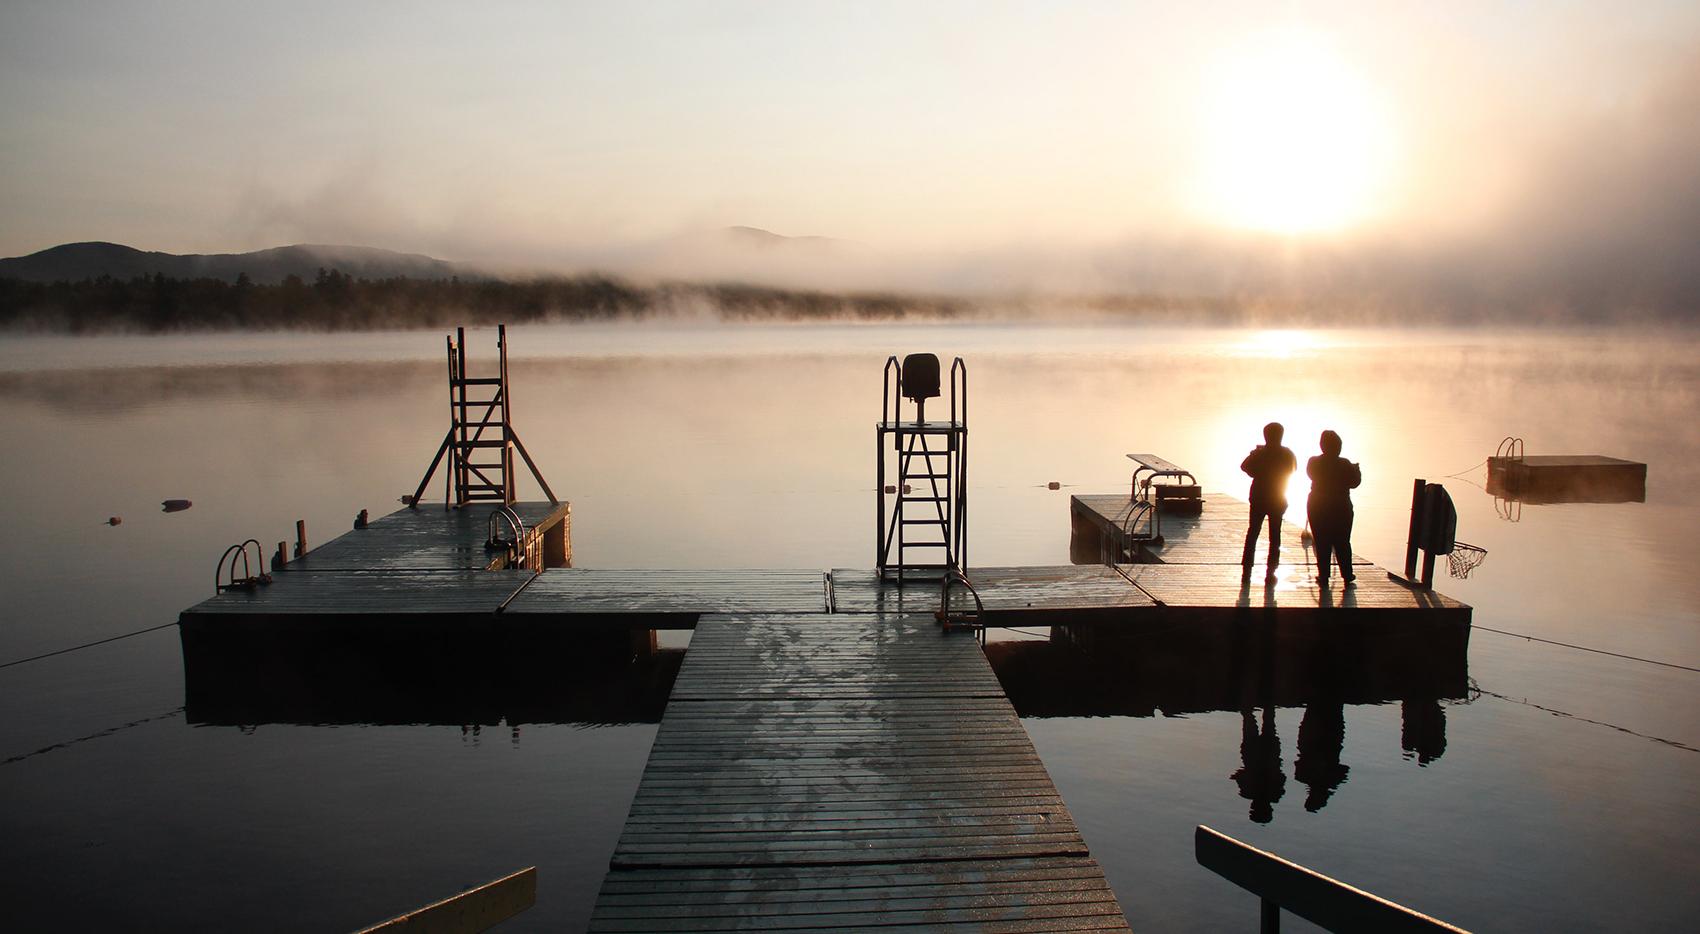 lake and jetty